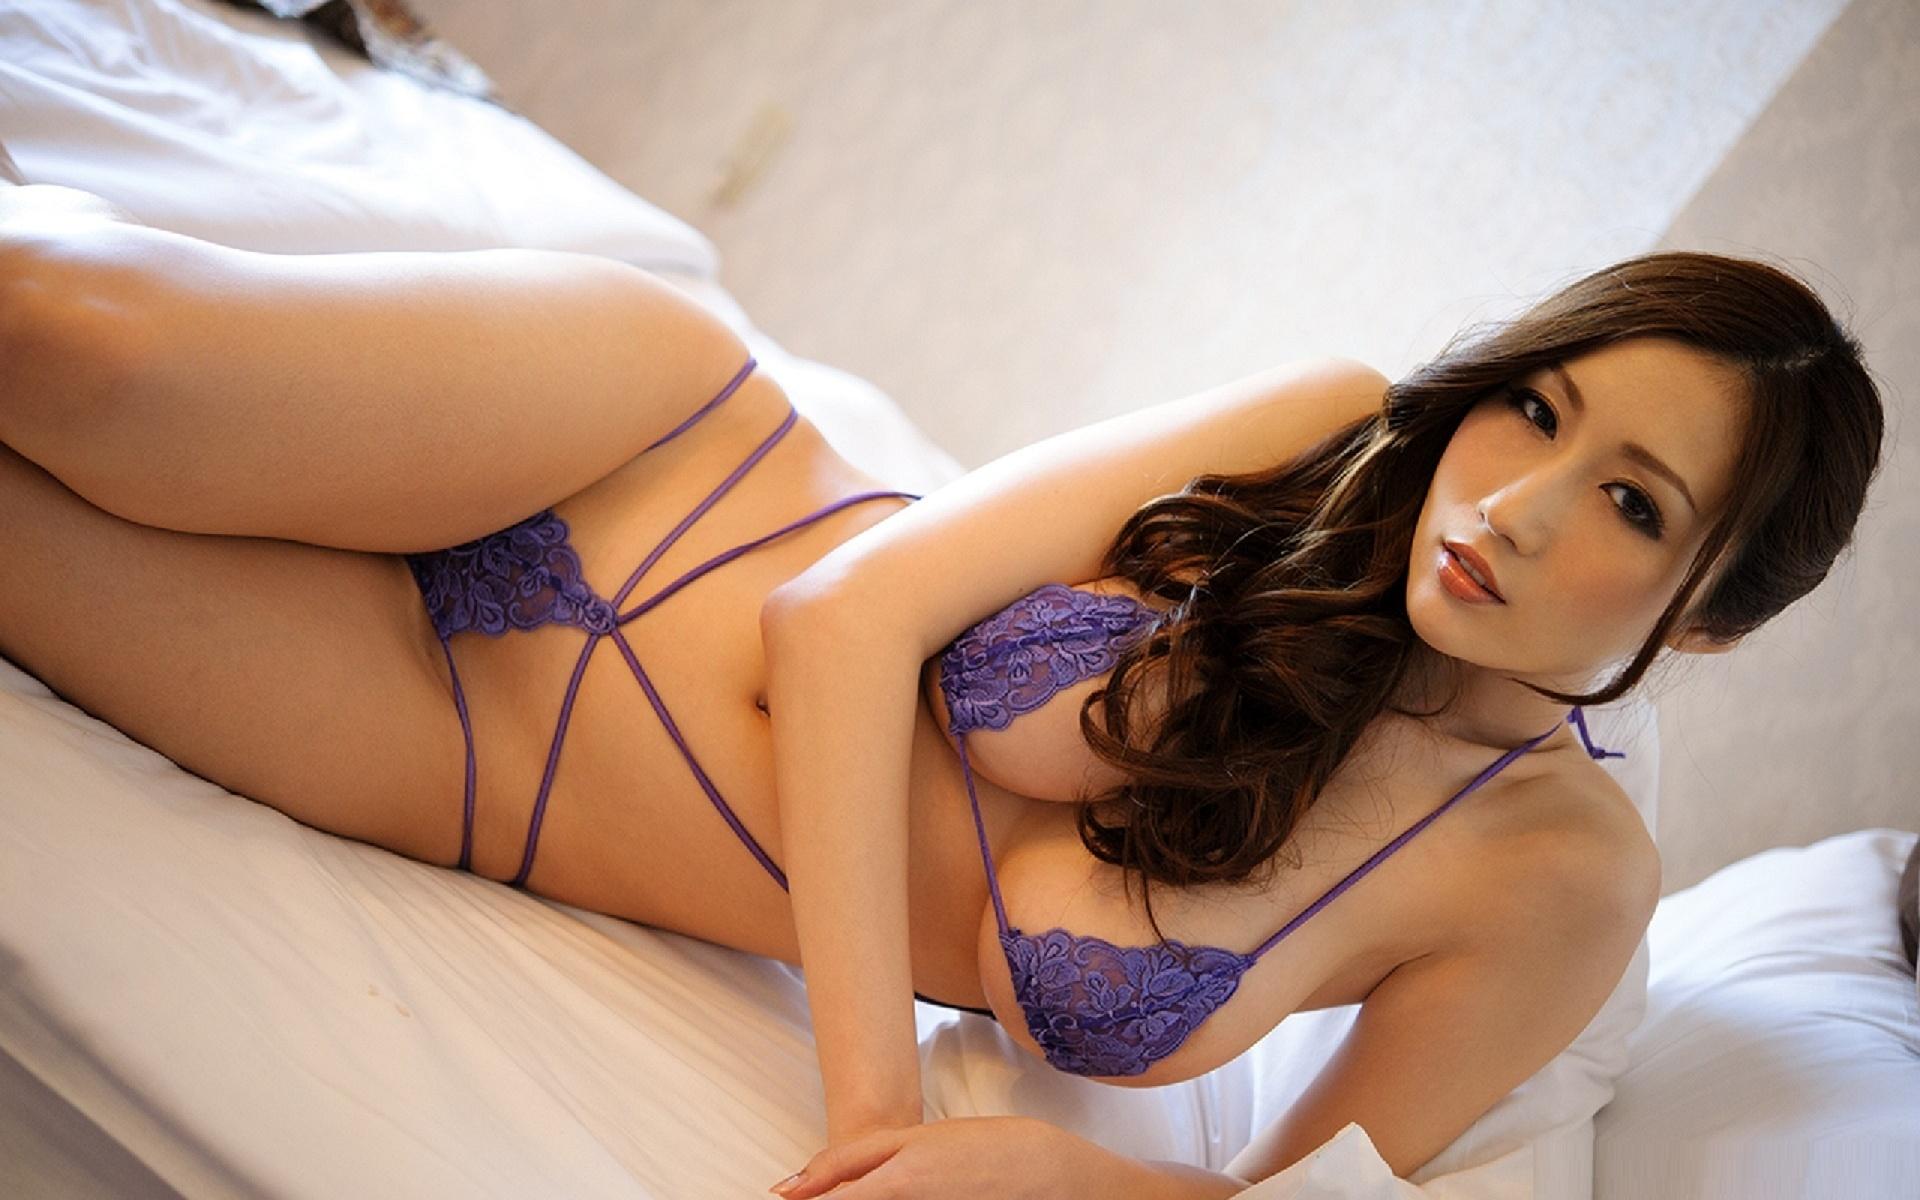 Au sexy beauty asian — photo 13